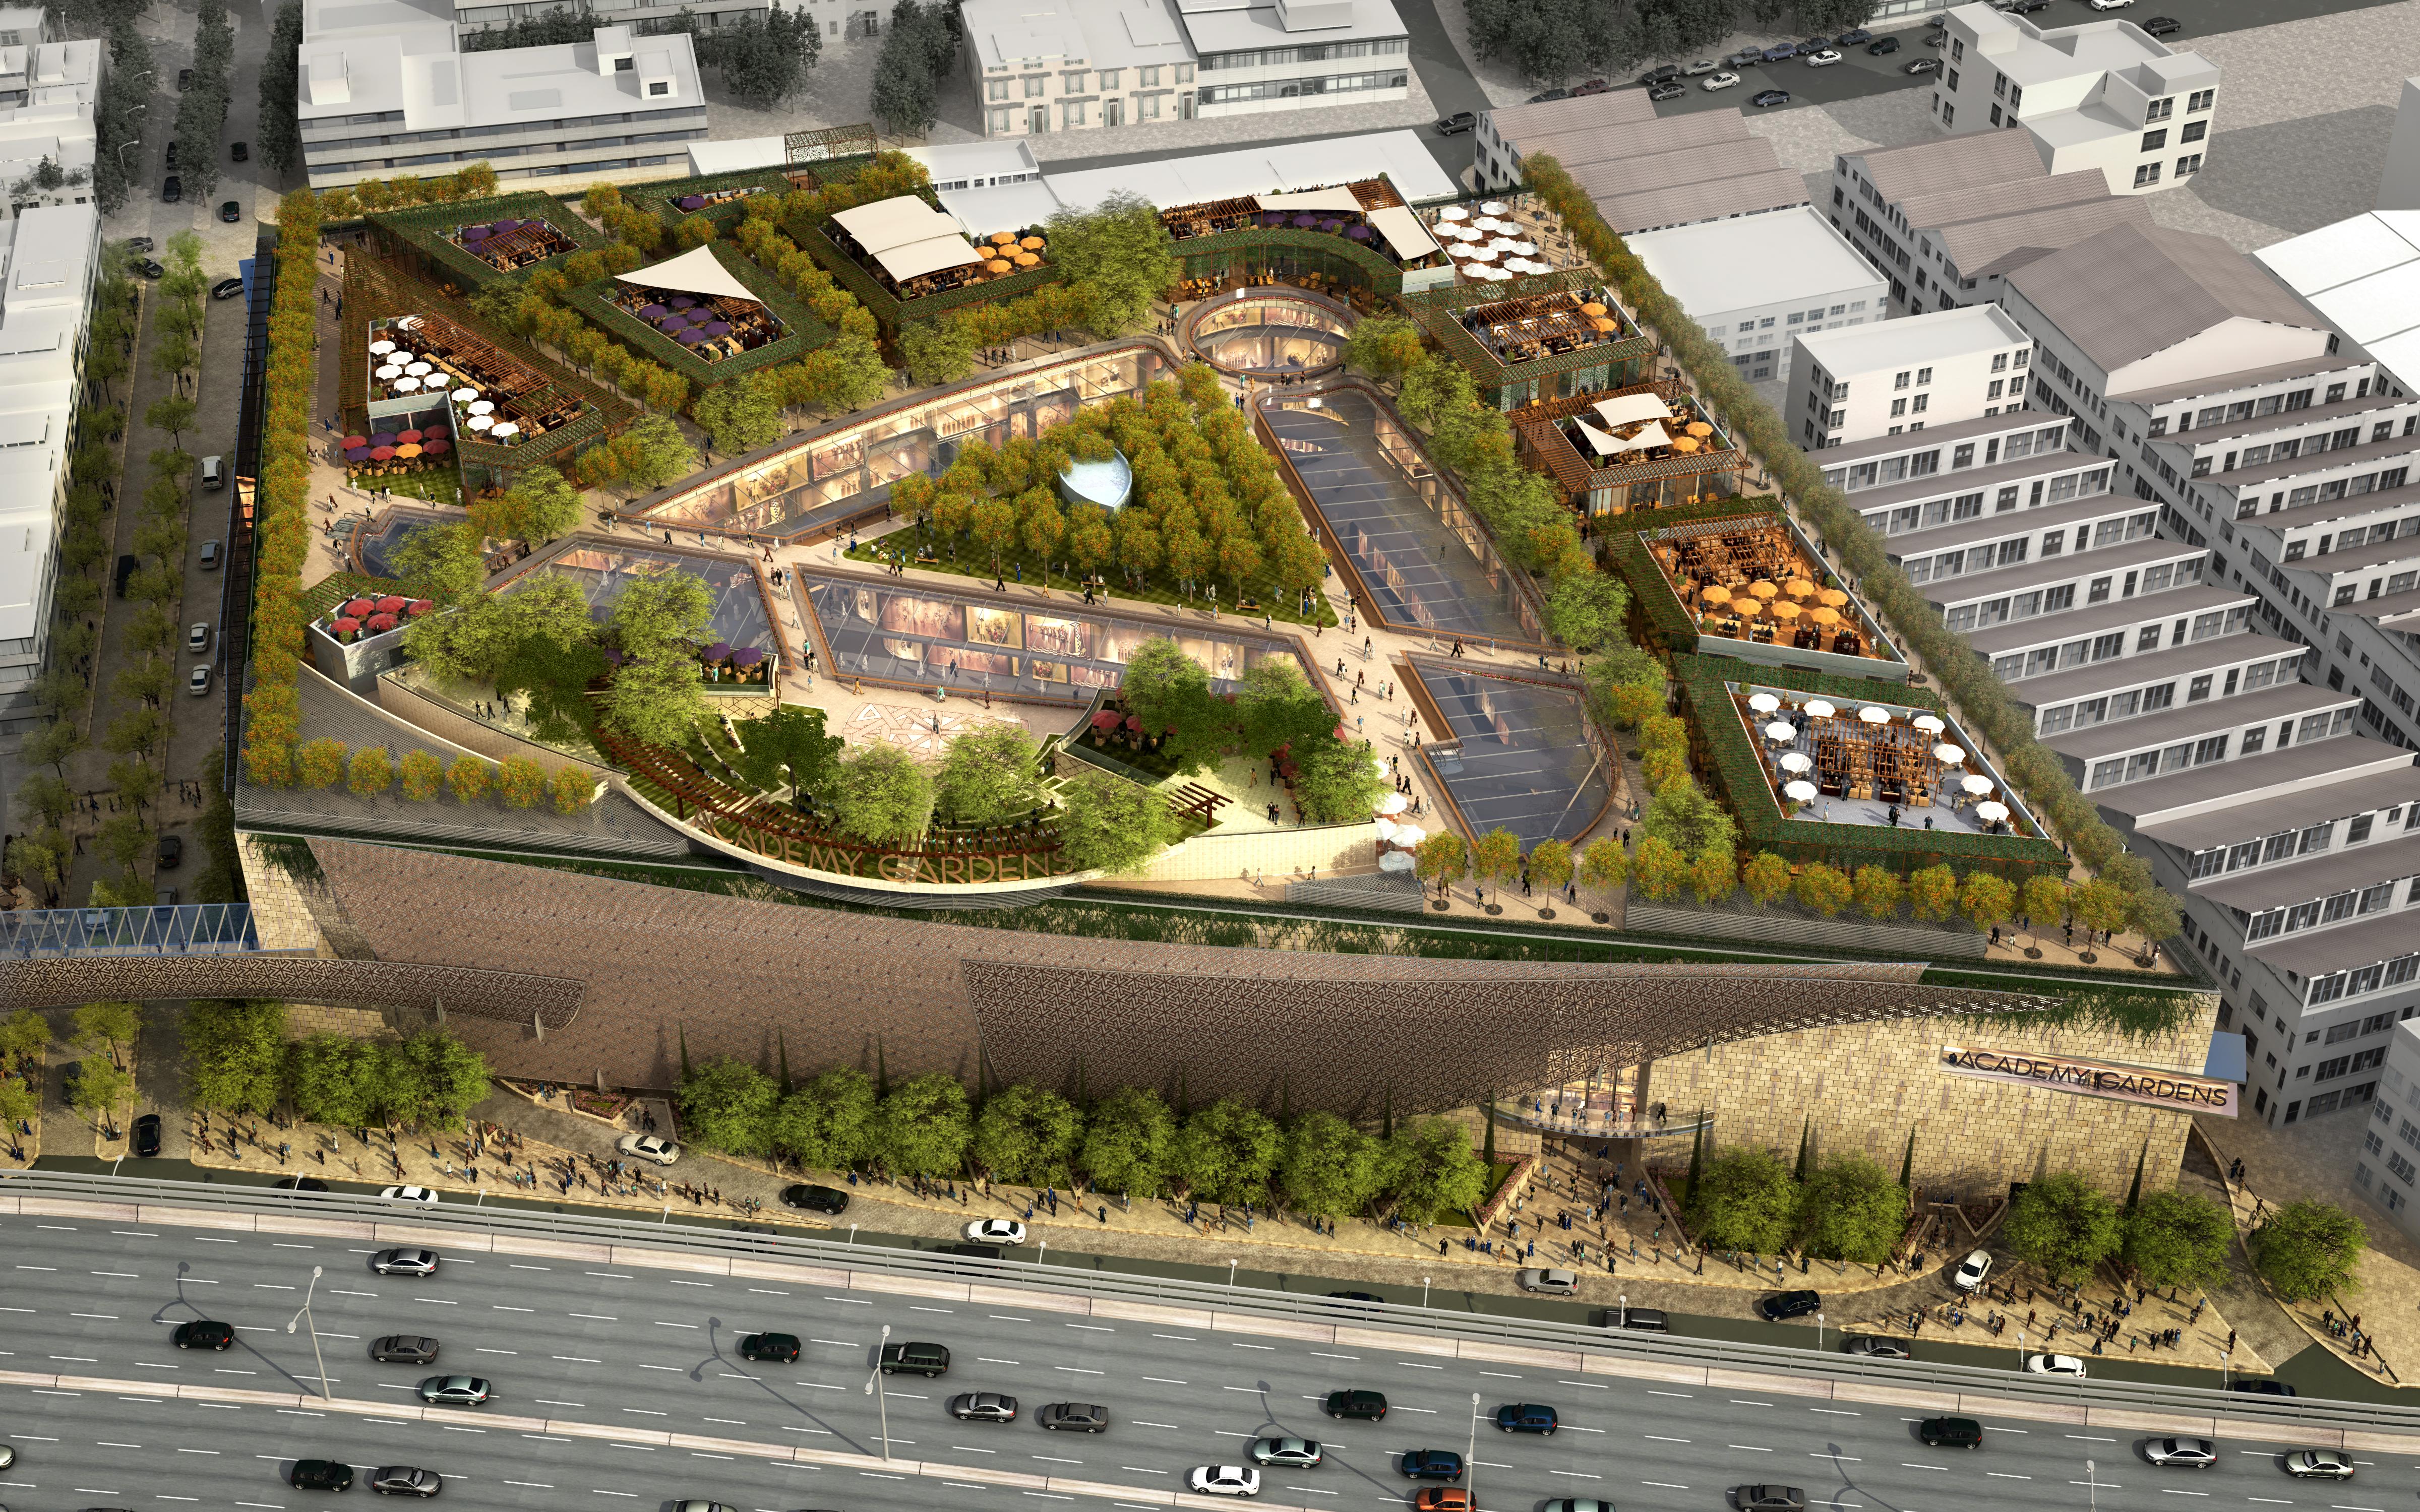 Academy Gardens